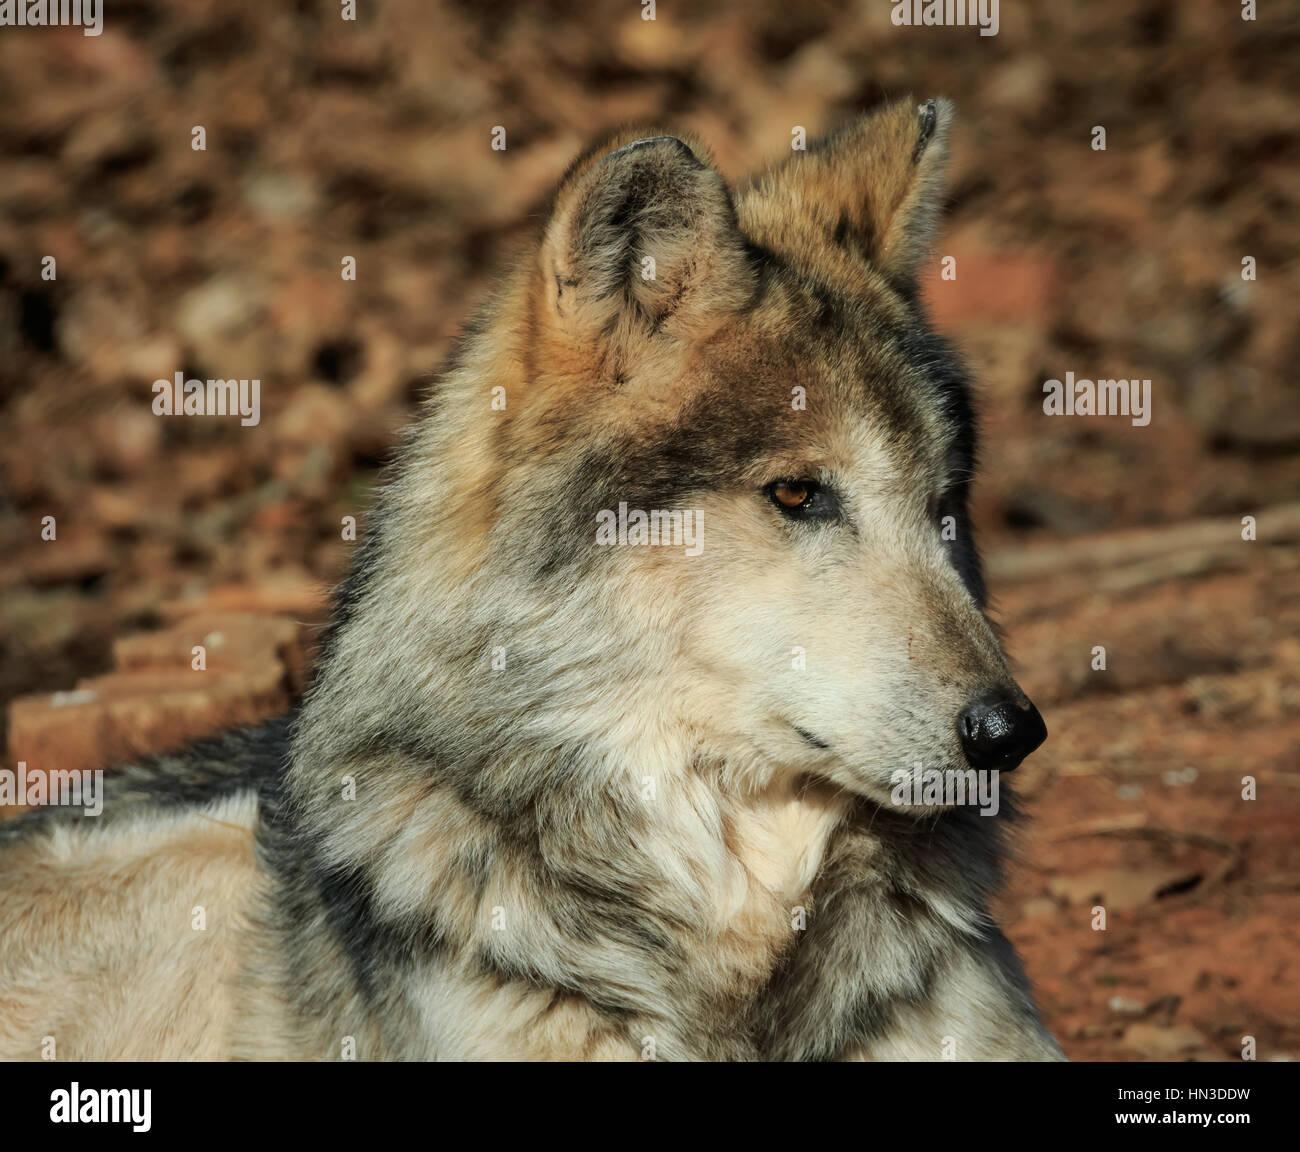 Eine mexikanische Grey Wolf aus dem Oklahoma City Zoo. Stockbild